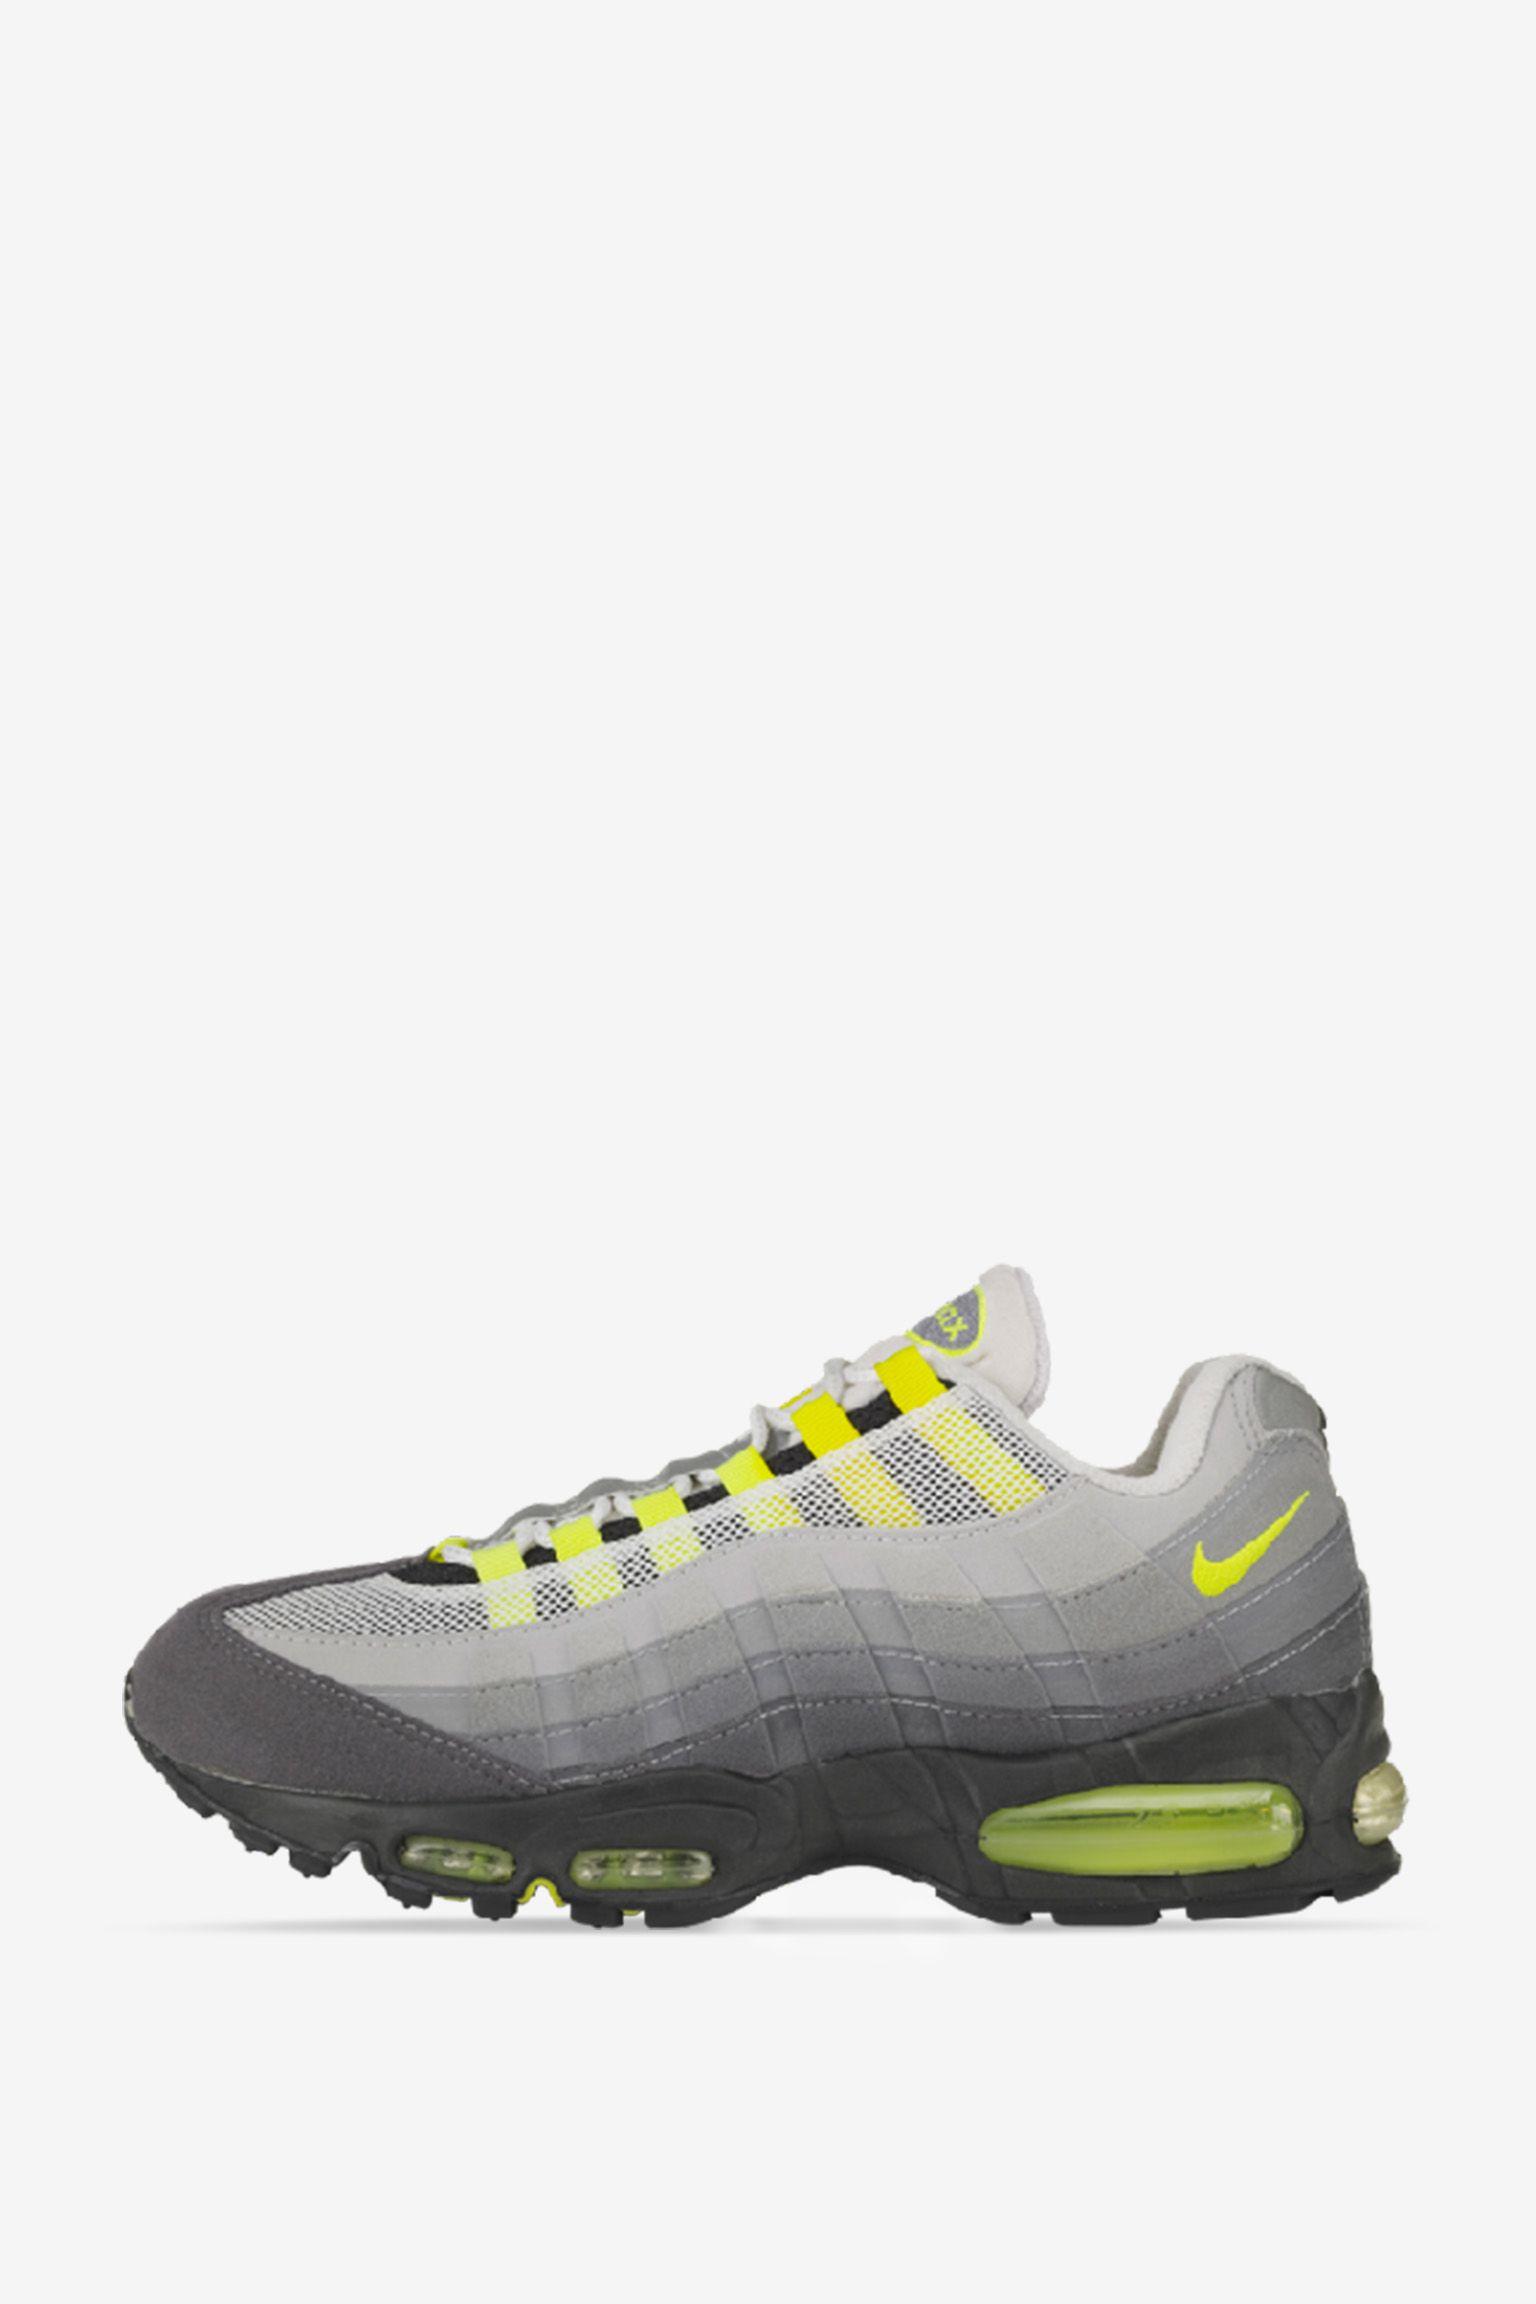 Nike Lebron 15 'Air Max 95' Release Date